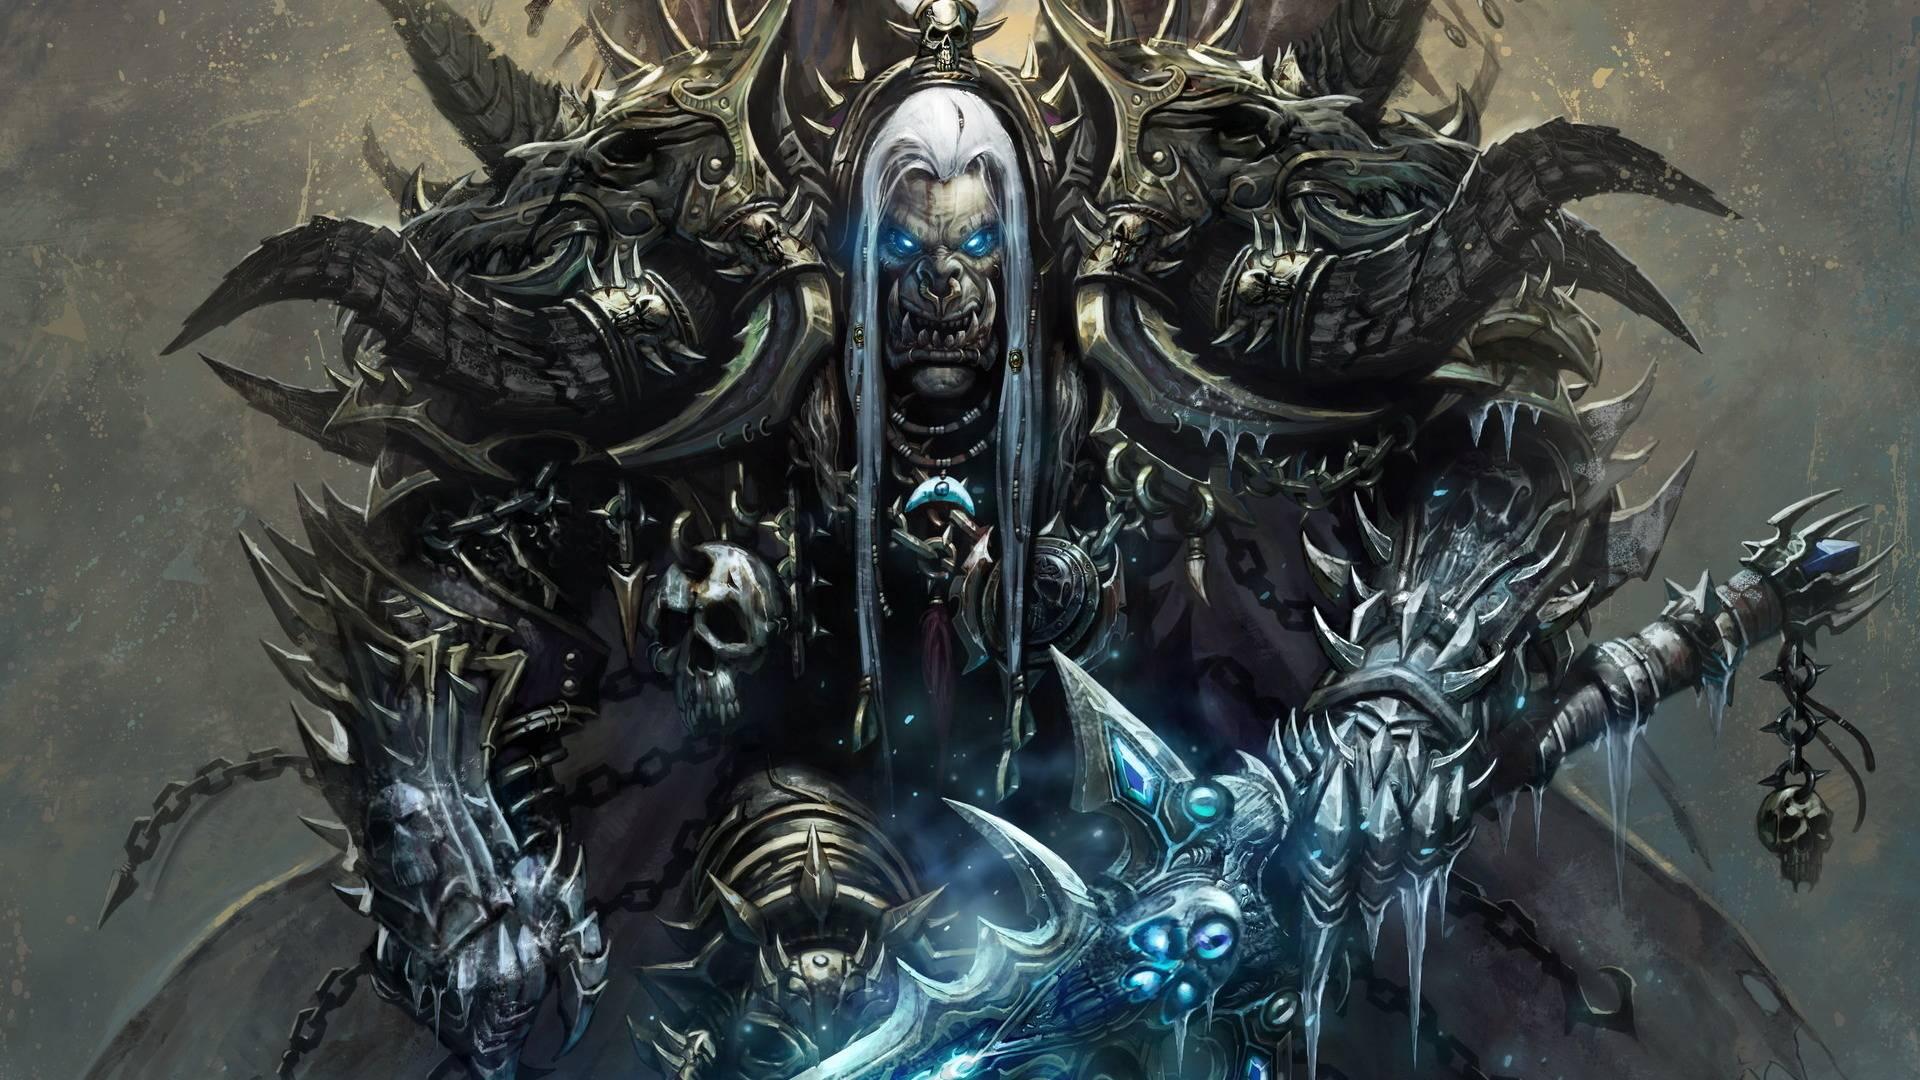 World Of Warcraft Wallpaper Cool World Of Warcraft 152838